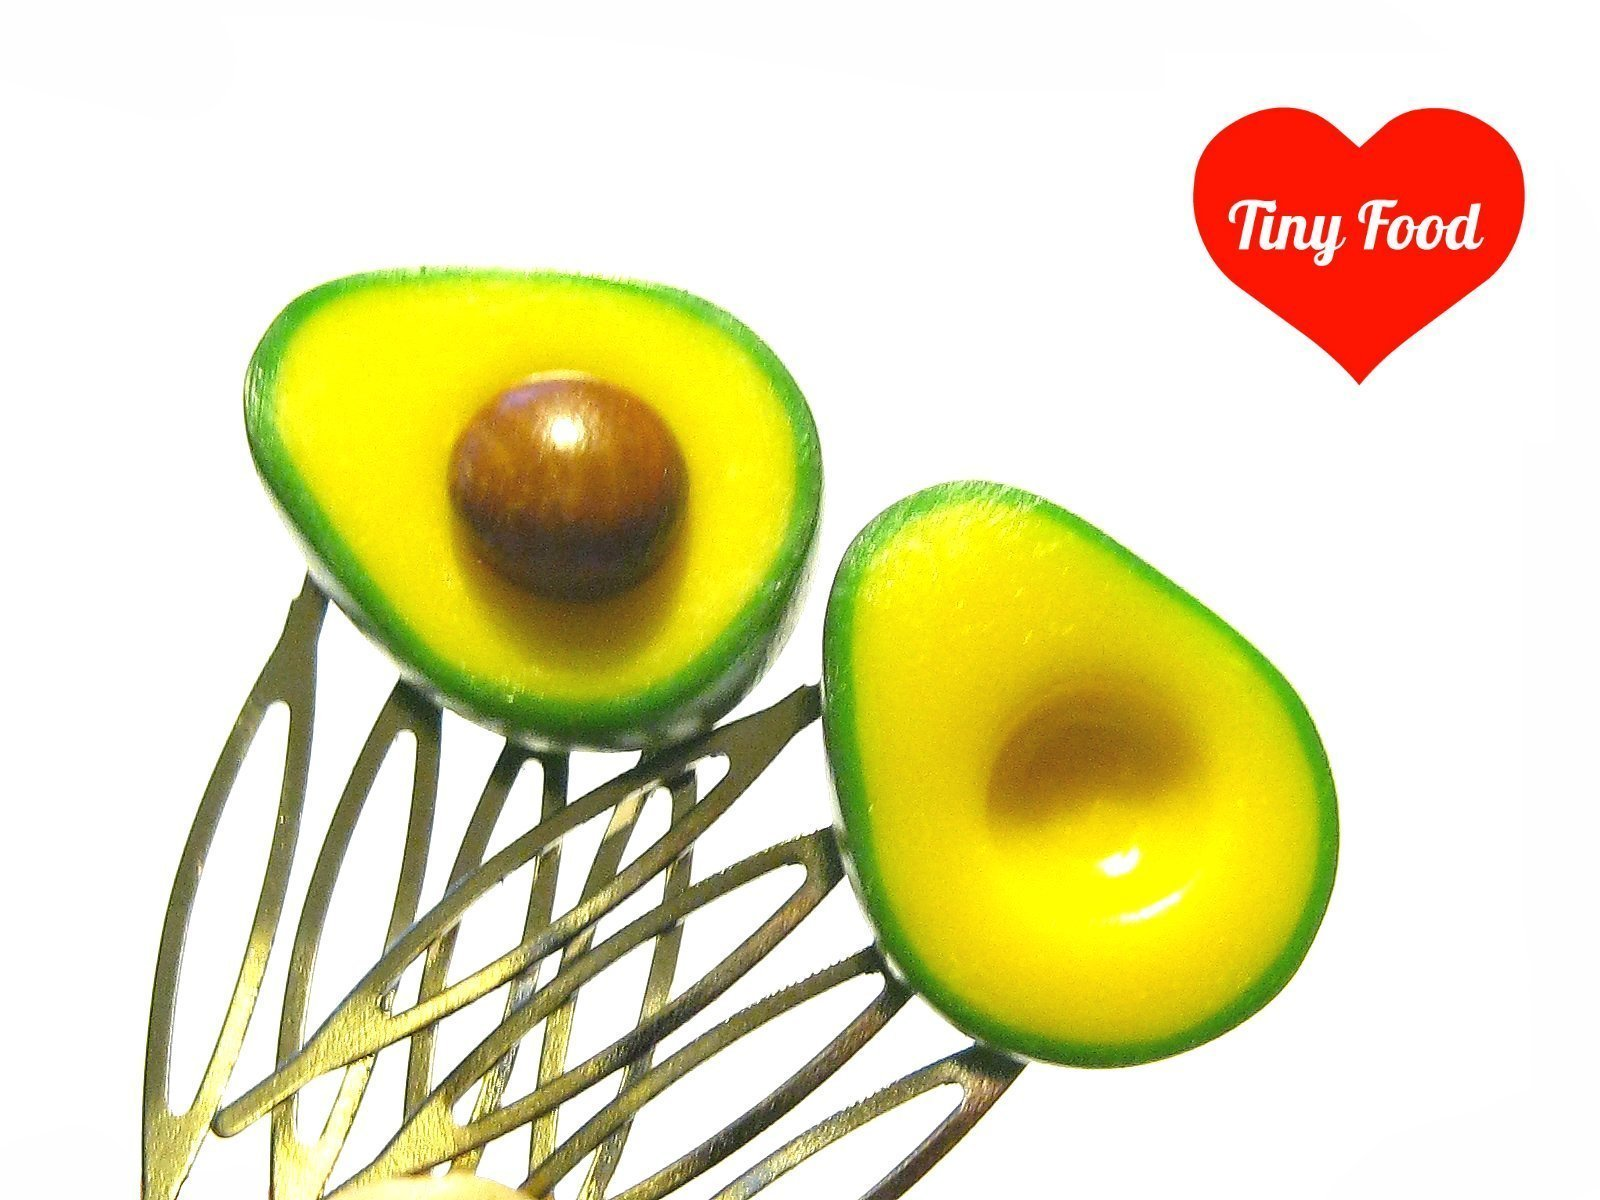 Avocado Comb Set - Tiny Food Jewelry